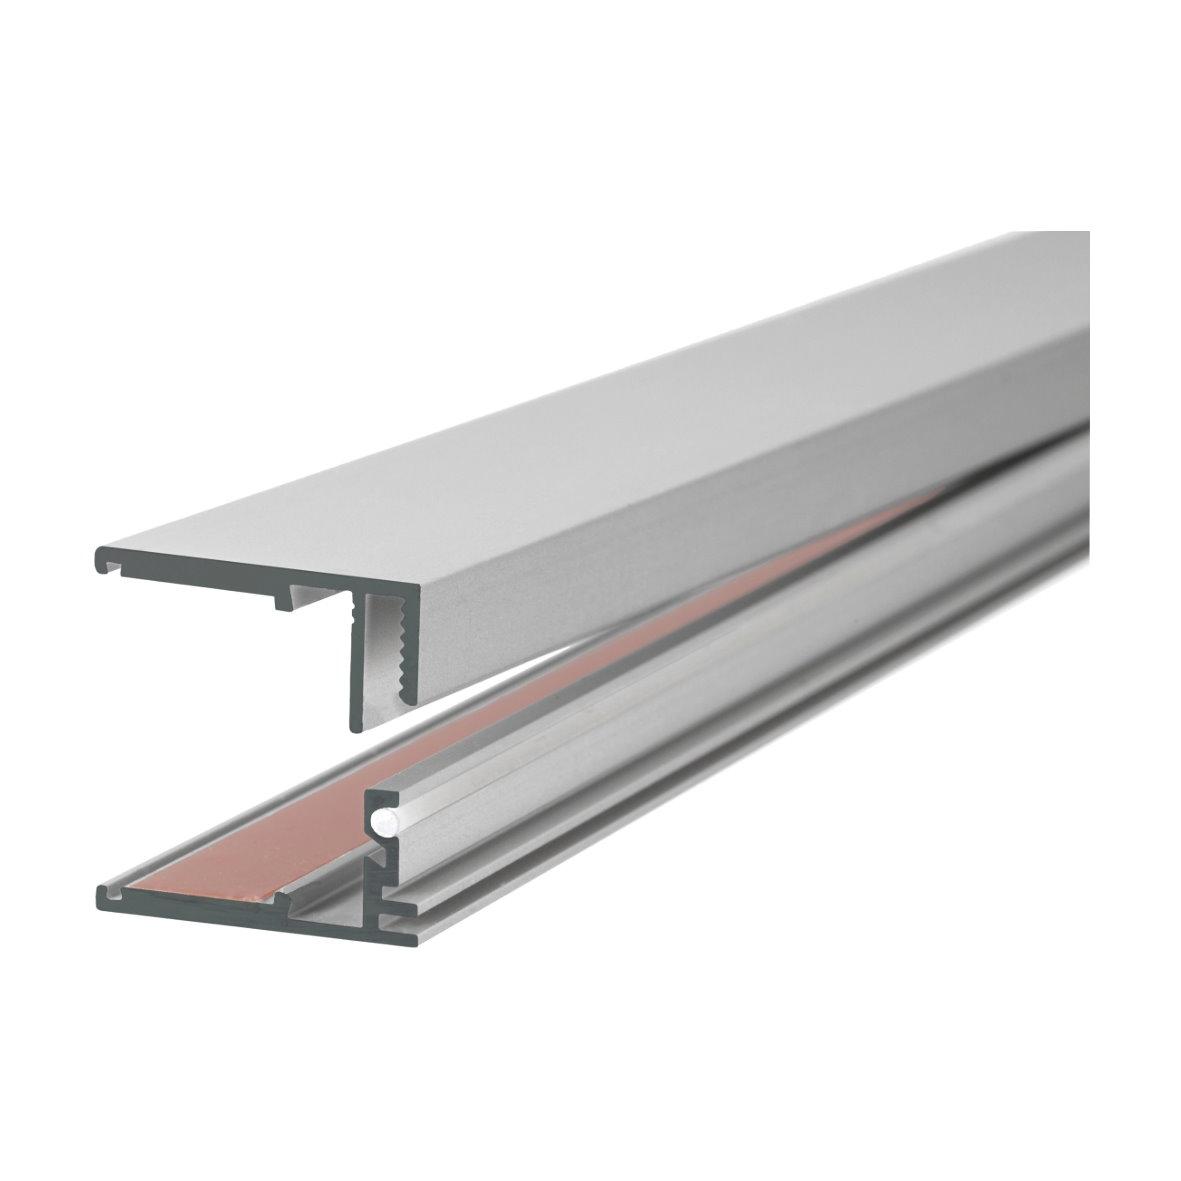 39 9 m led alu profil aluprofil aluminium schiene. Black Bedroom Furniture Sets. Home Design Ideas